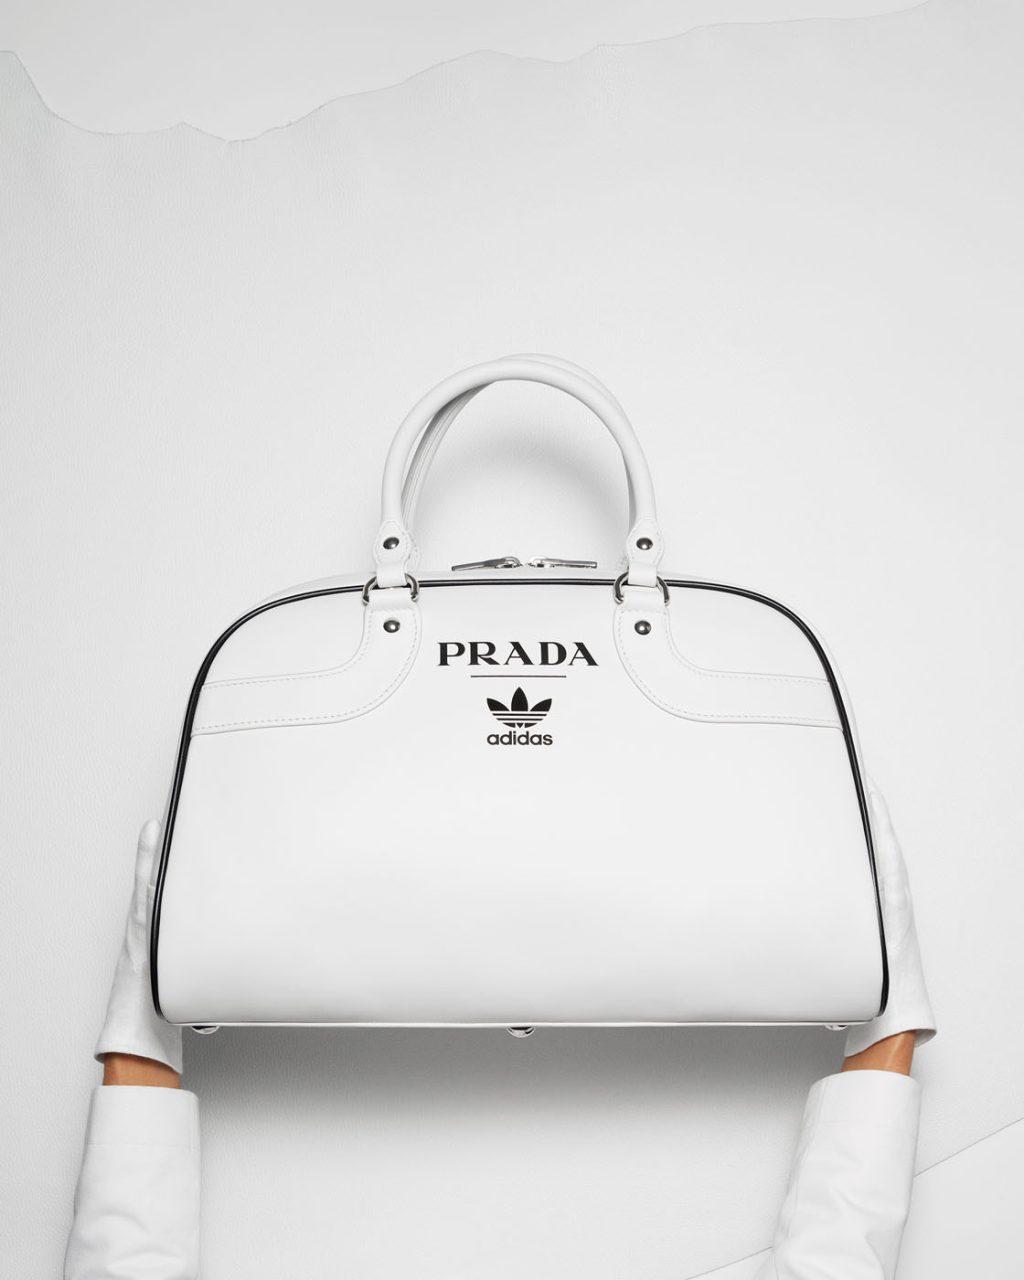 prada-adidas-collaboration-sneaker-release-20191204